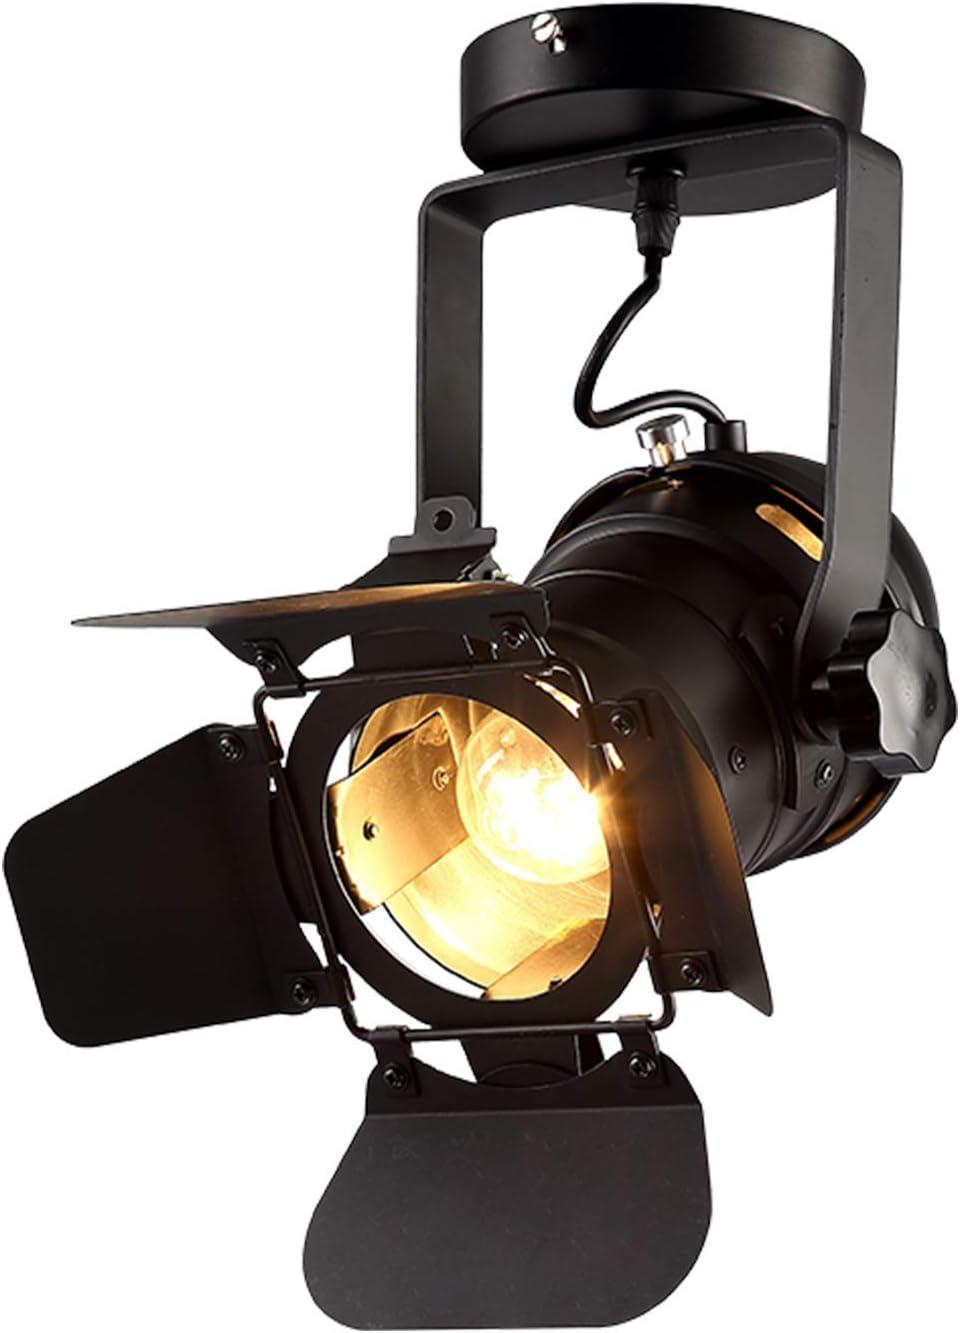 Retro Spot Light Industrial Ceiling Track Lighting Stage Spotlight Pendant Lamp